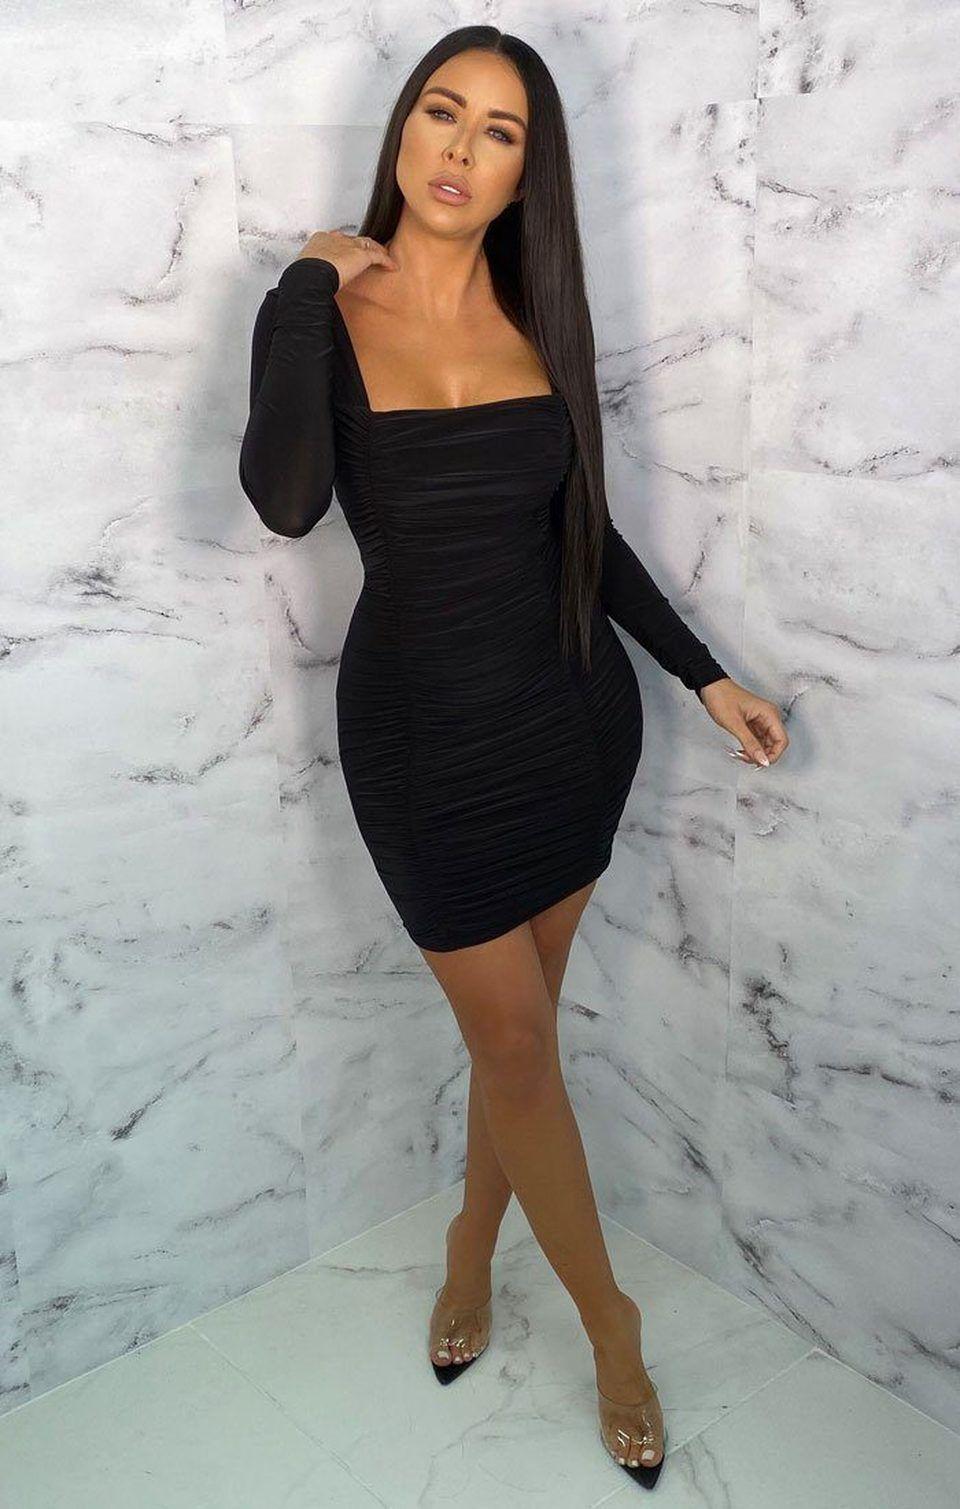 Black Square Neck Ruched Bodycon Mini Dress Gina Black Ruched Dress Black Dress Outfit Casual Mini Dress [ 1509 x 960 Pixel ]